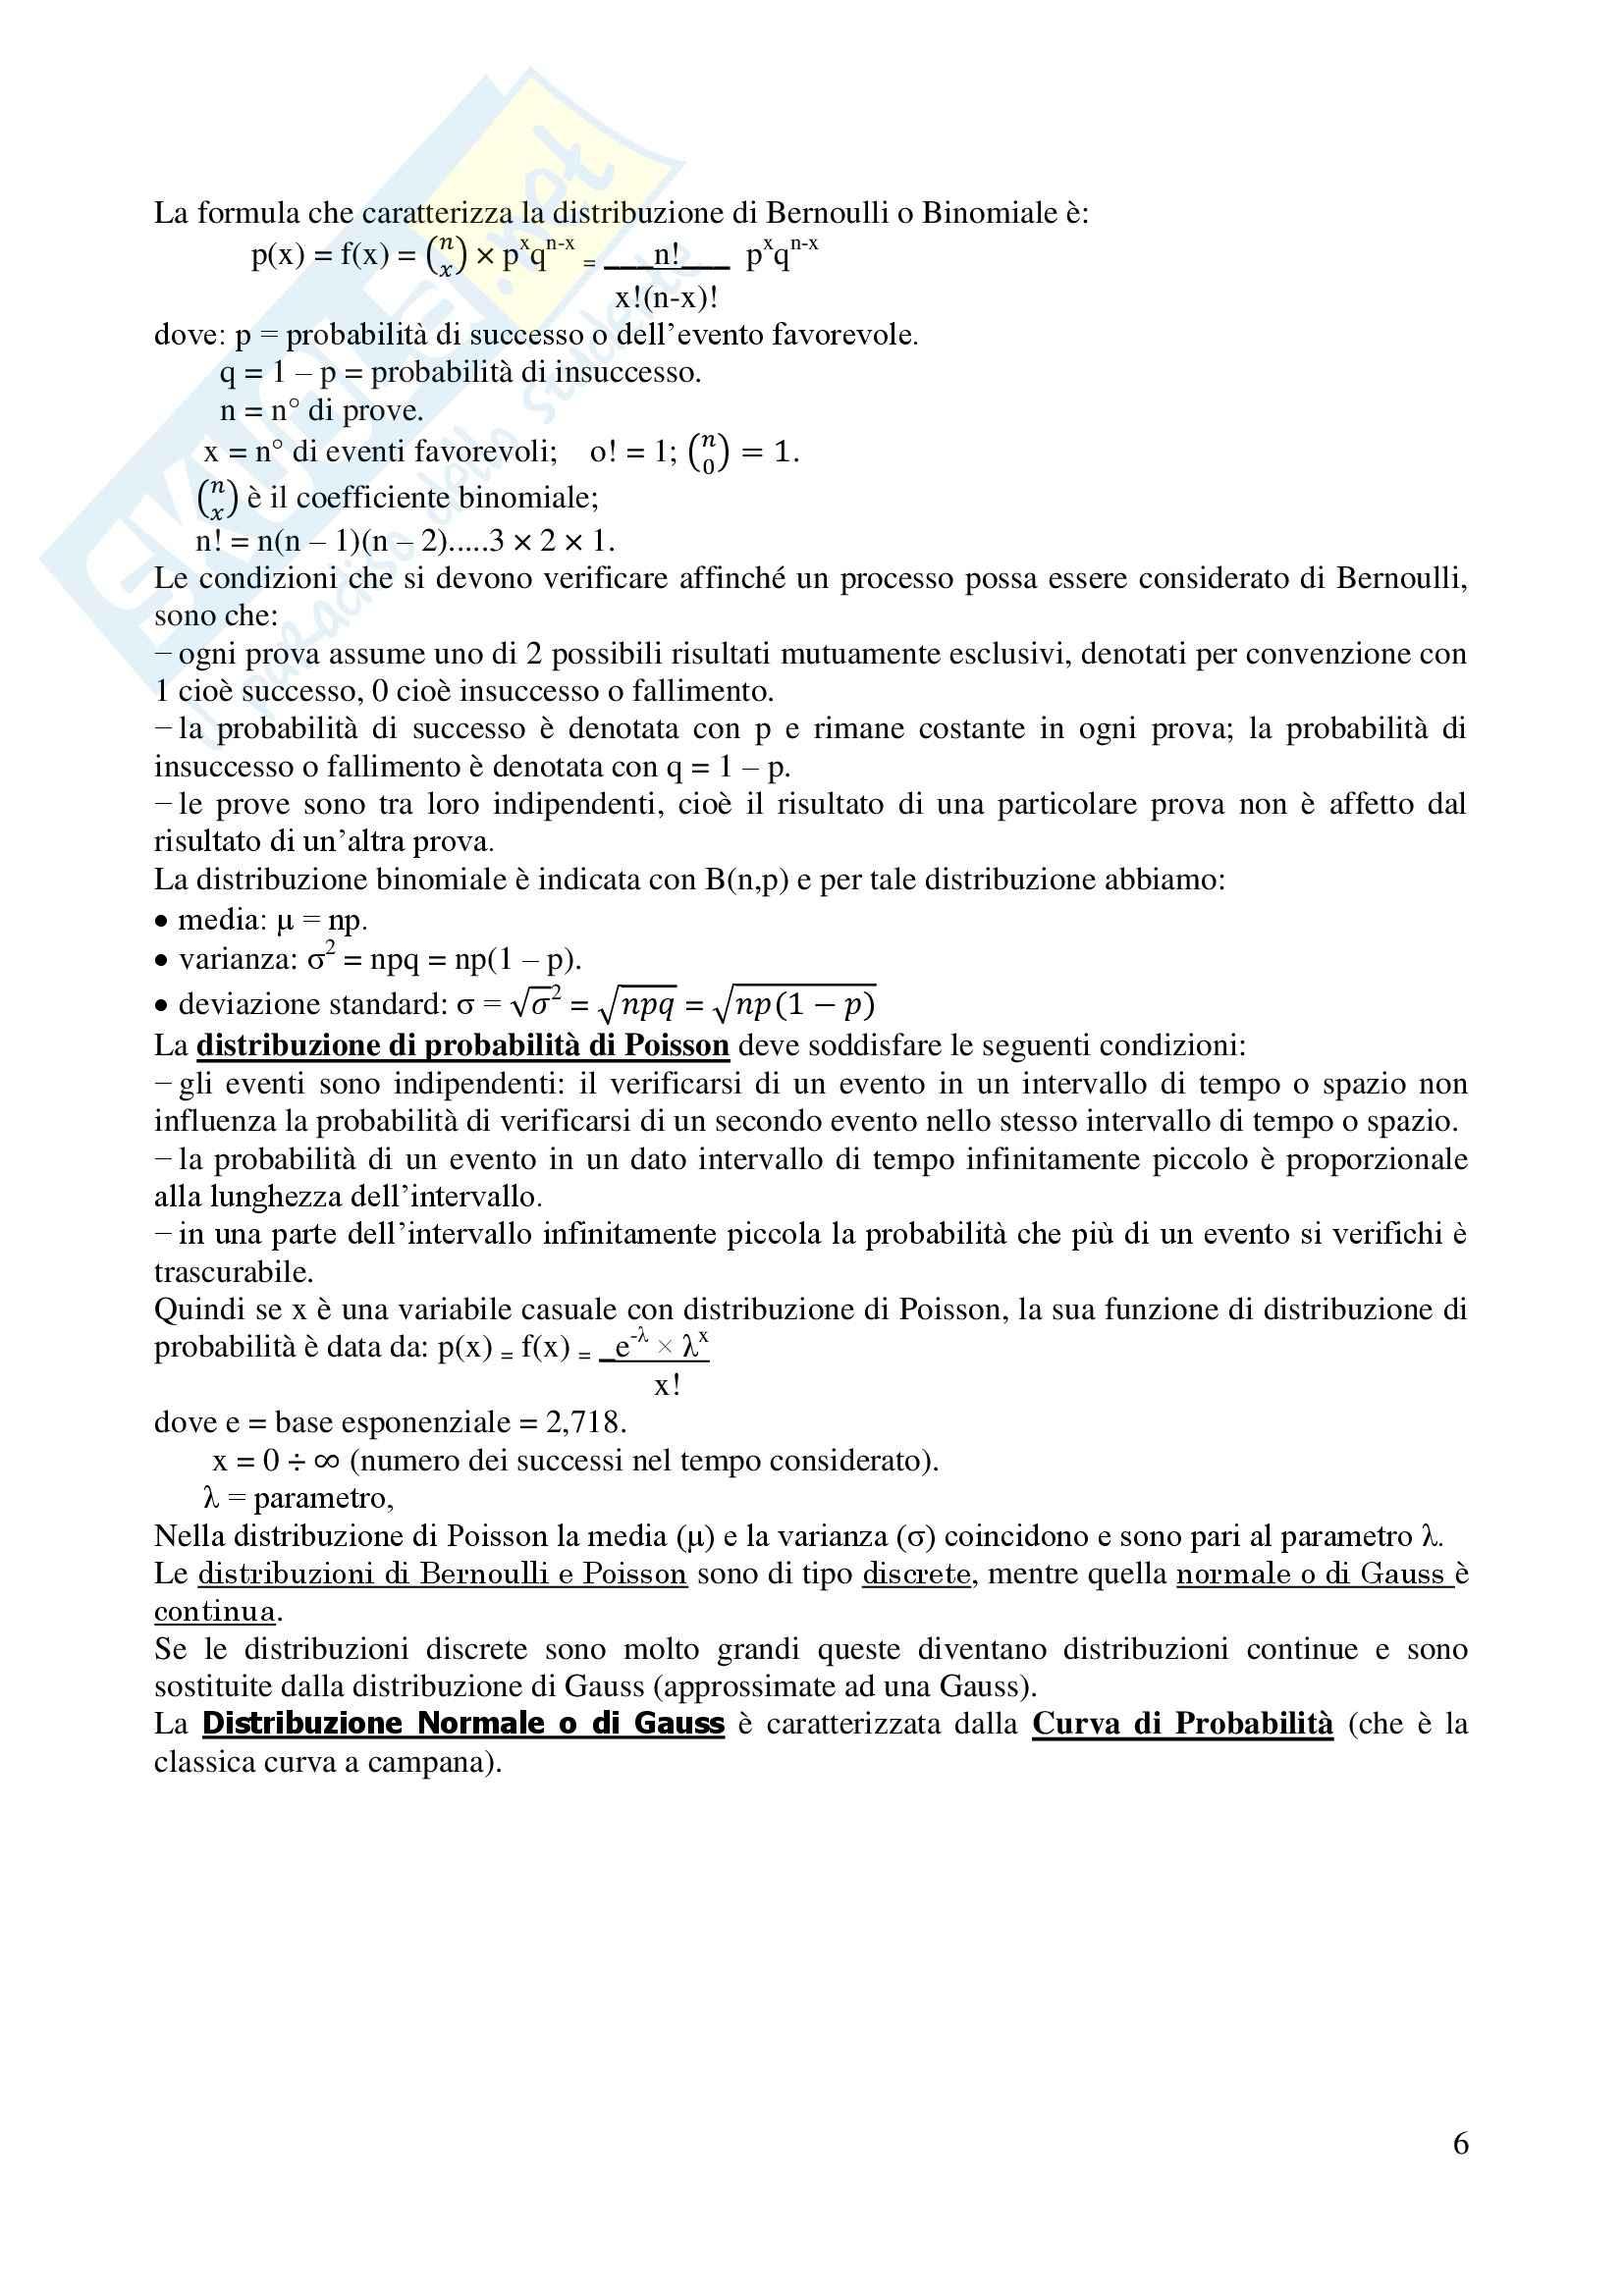 Statistica - Appunti Pag. 6